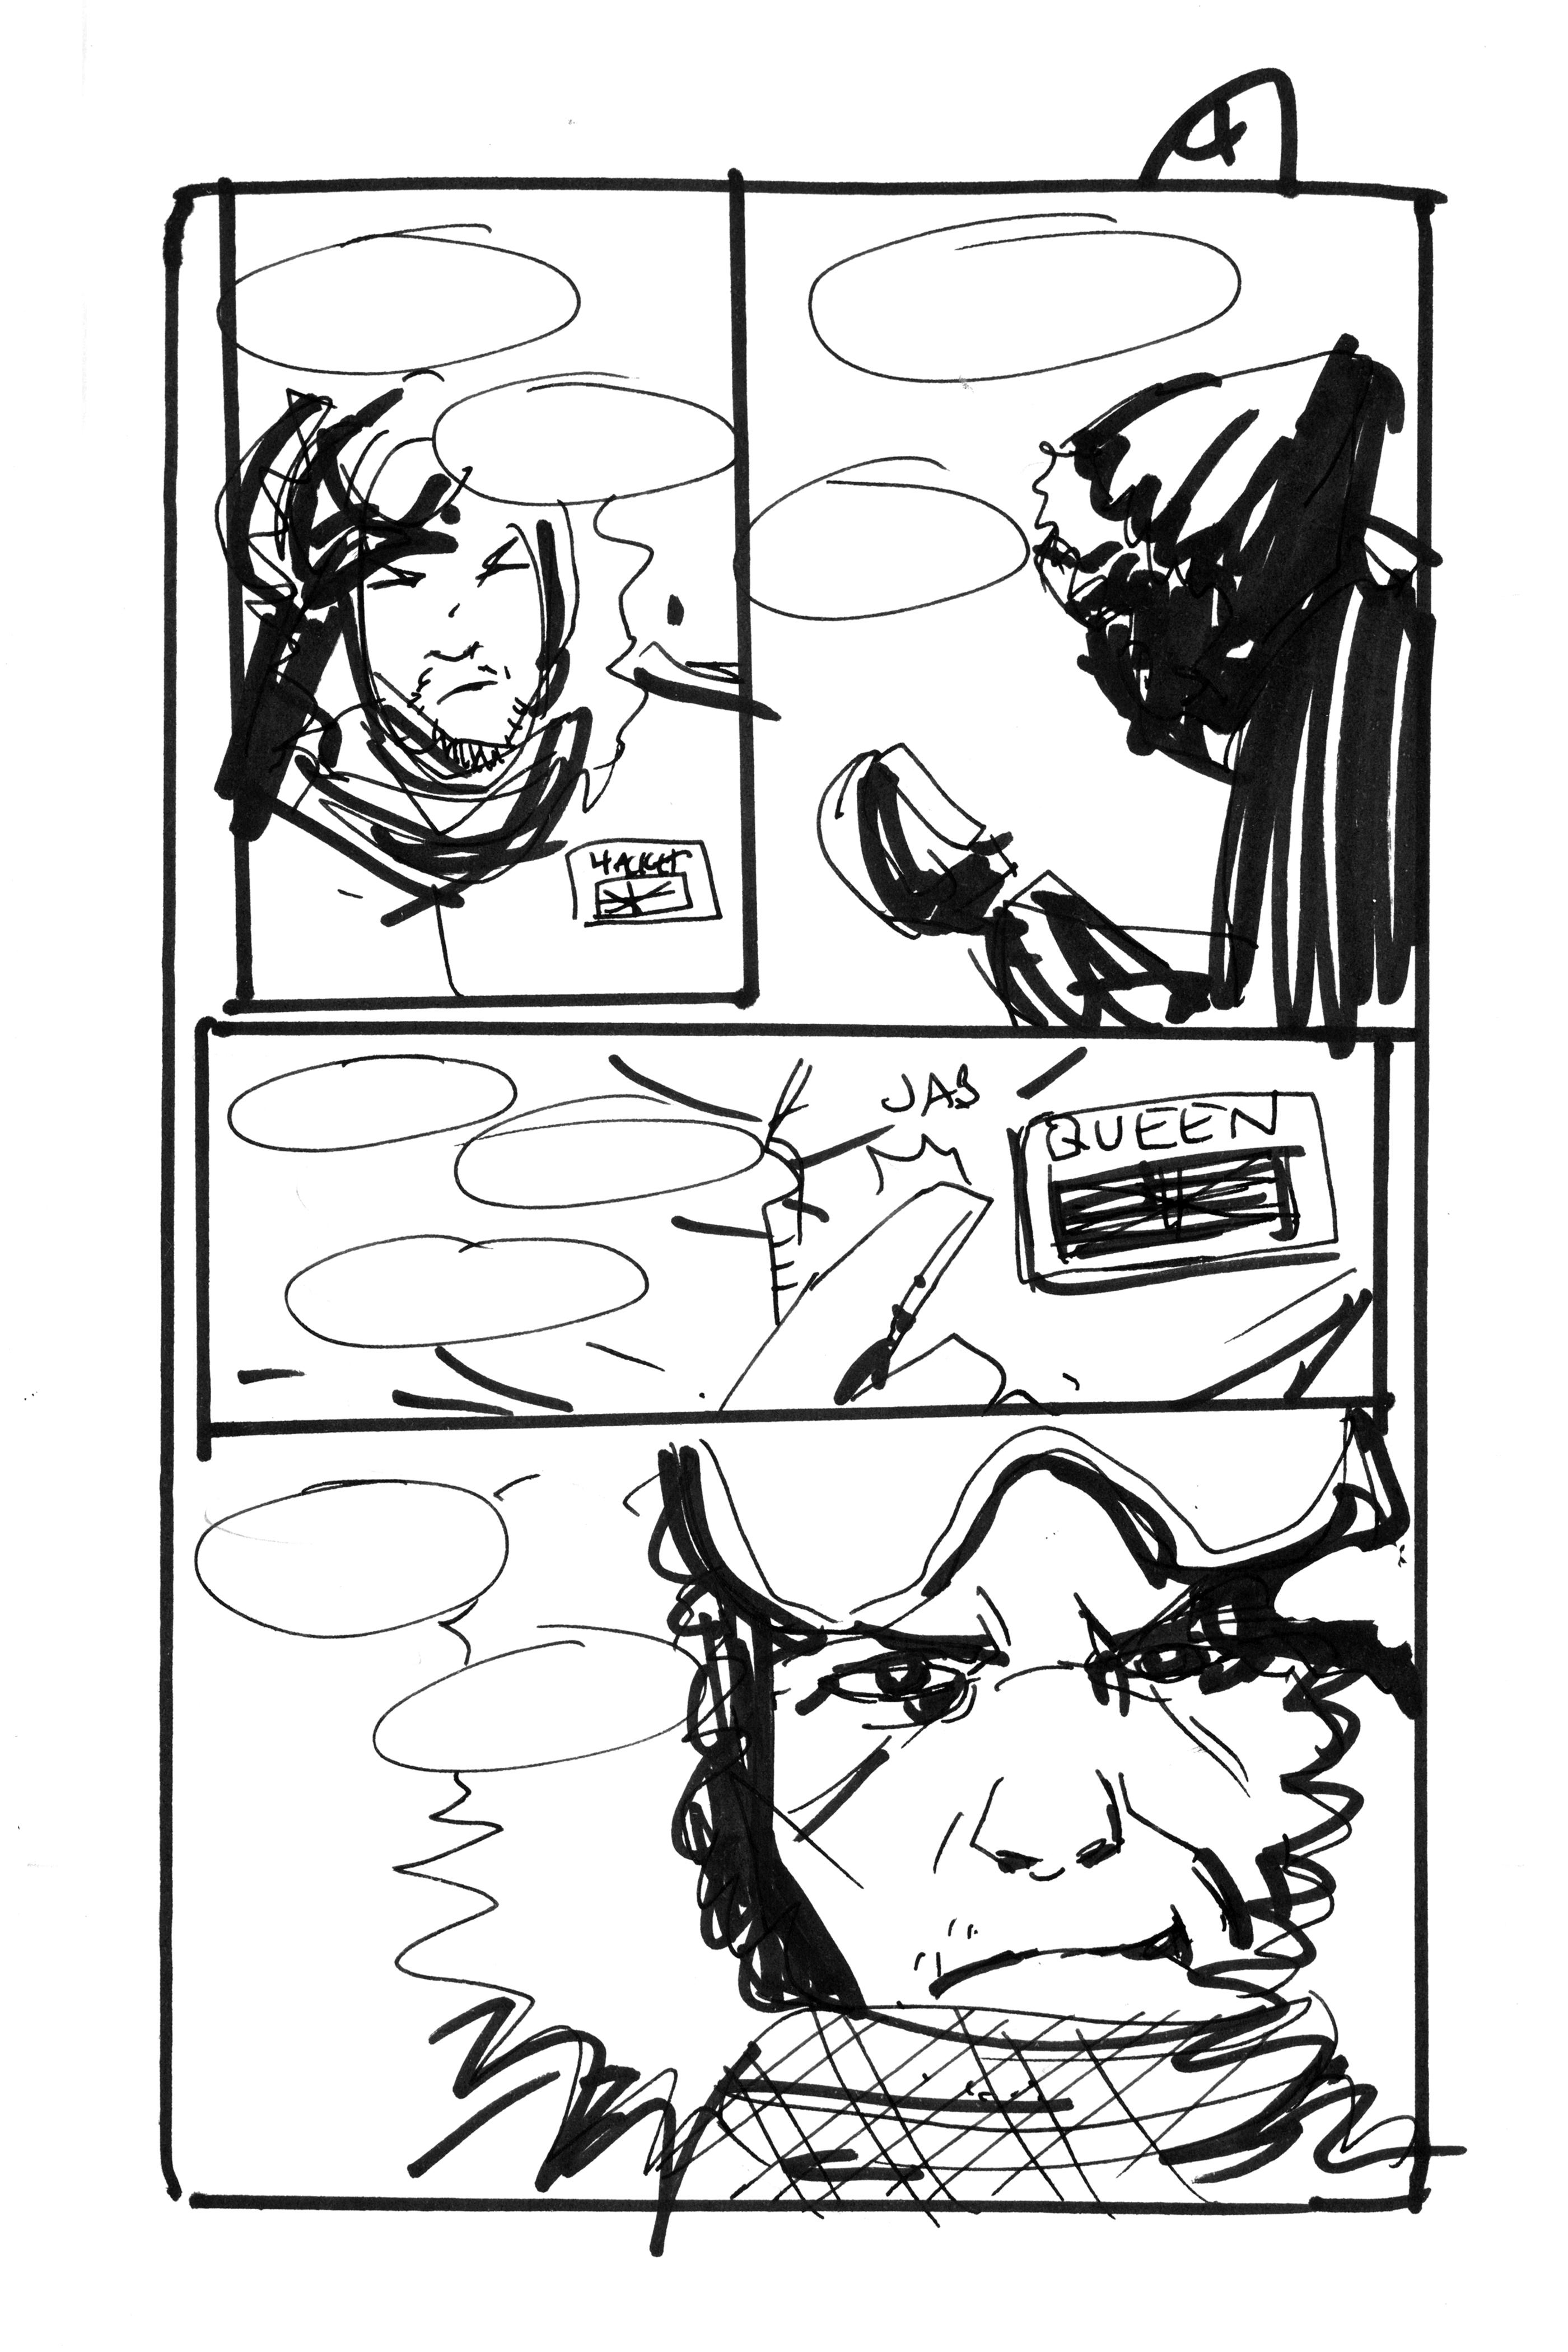 http://www.urban-comics.com/wp-content/uploads/2013/10/pp4.jpg